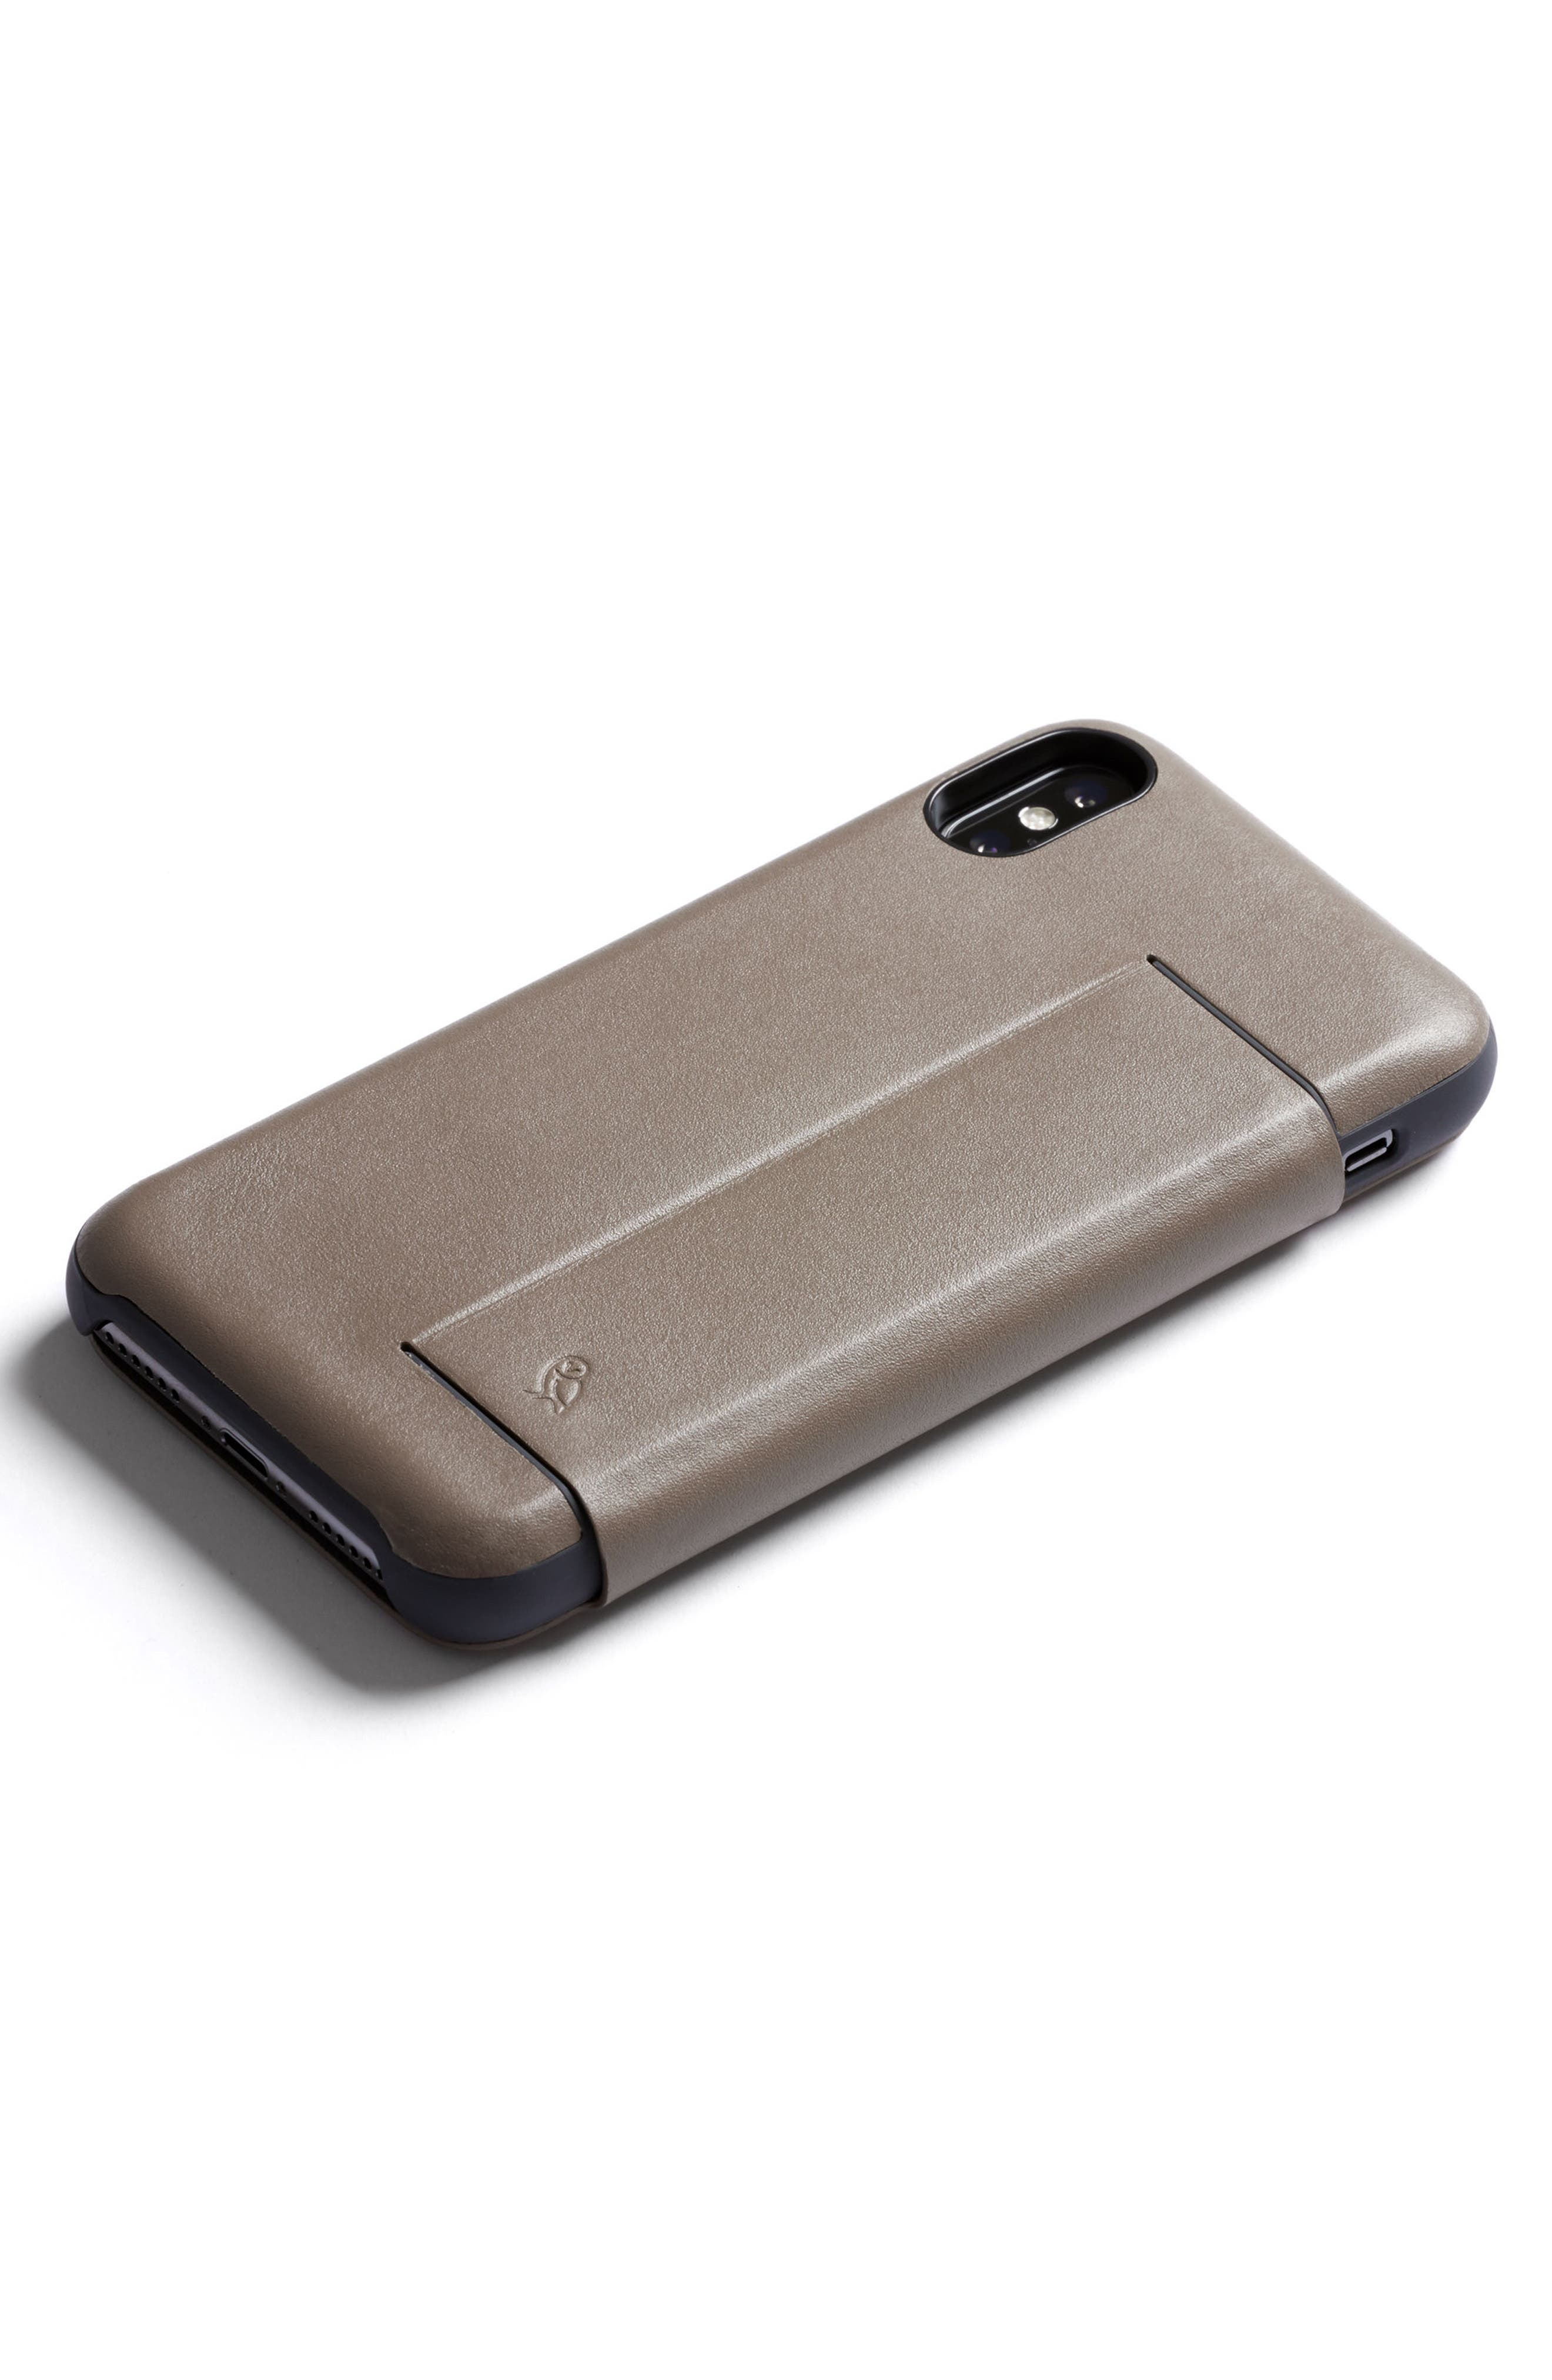 Bellroy iPhone X Phone Wallet